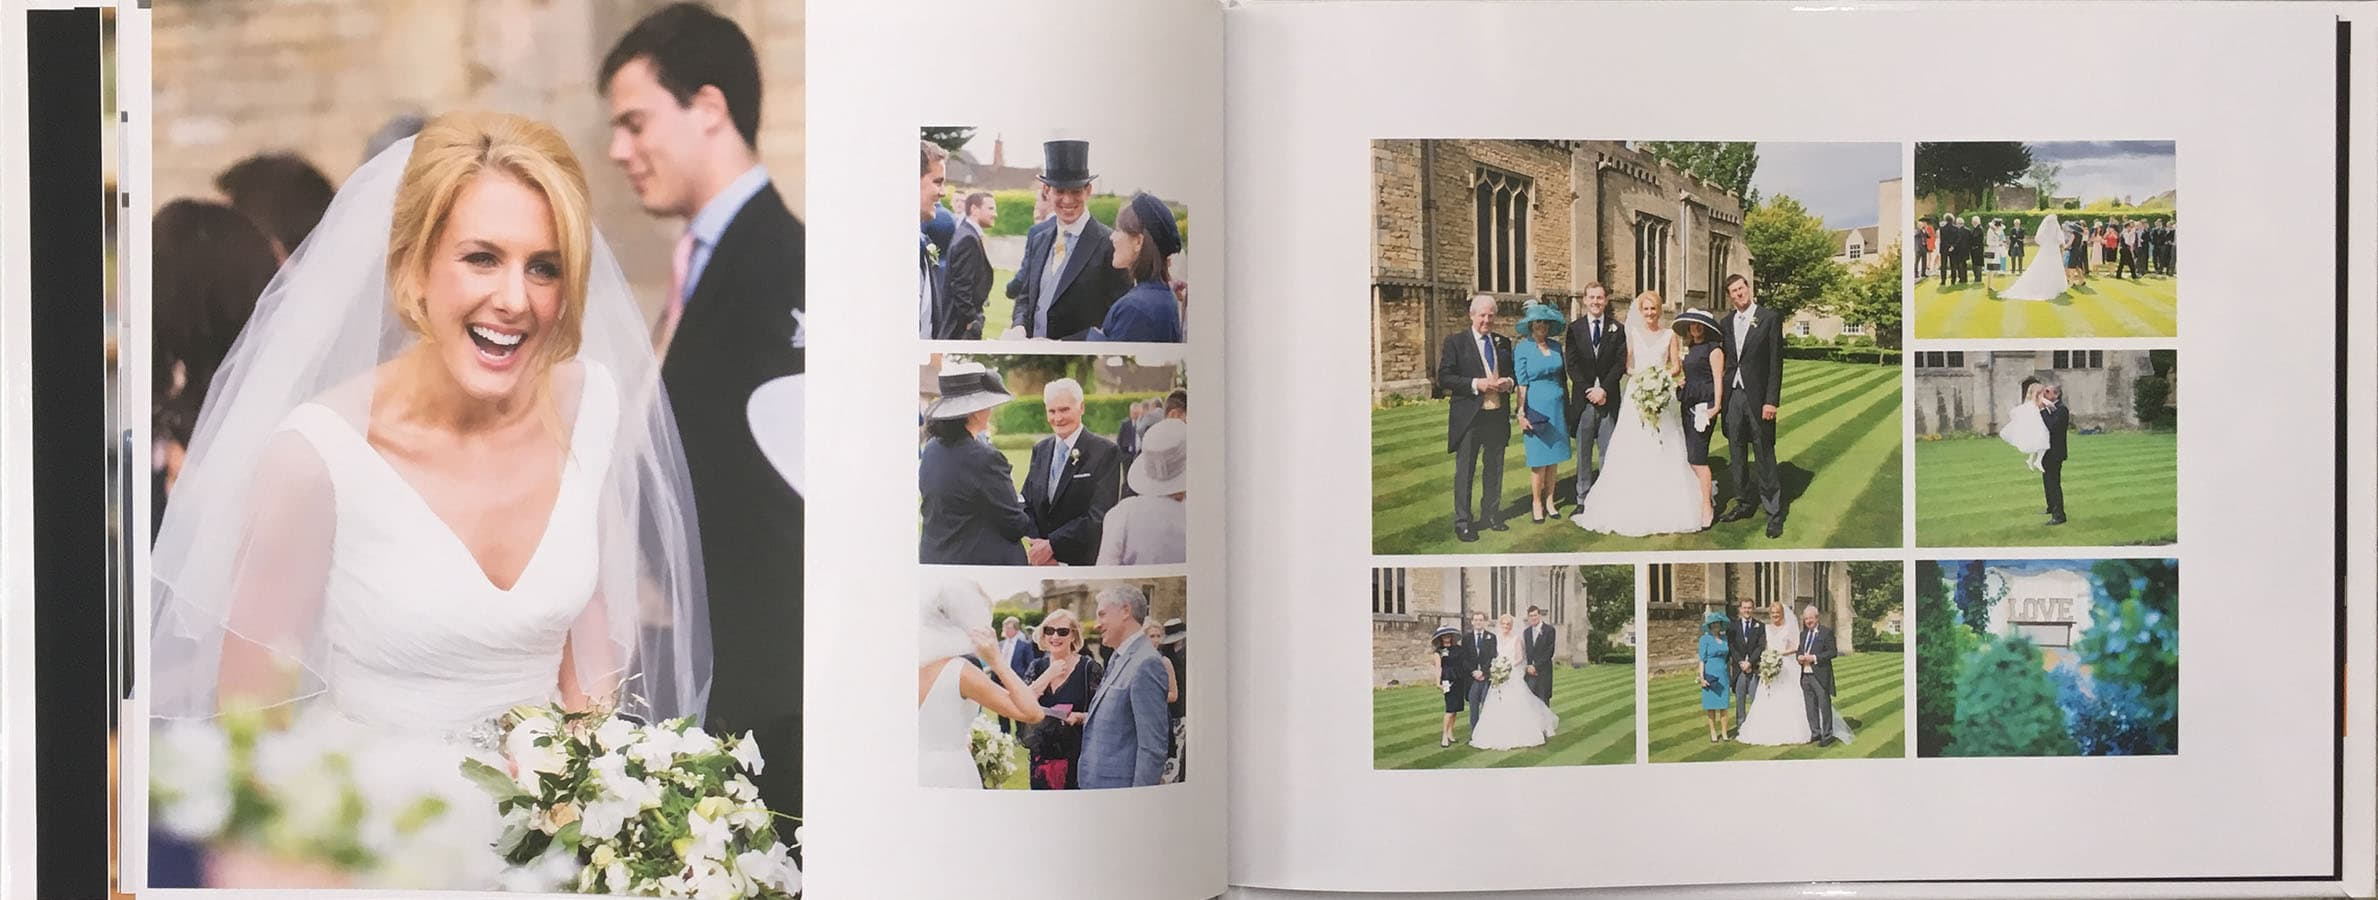 Photobook-wedding2